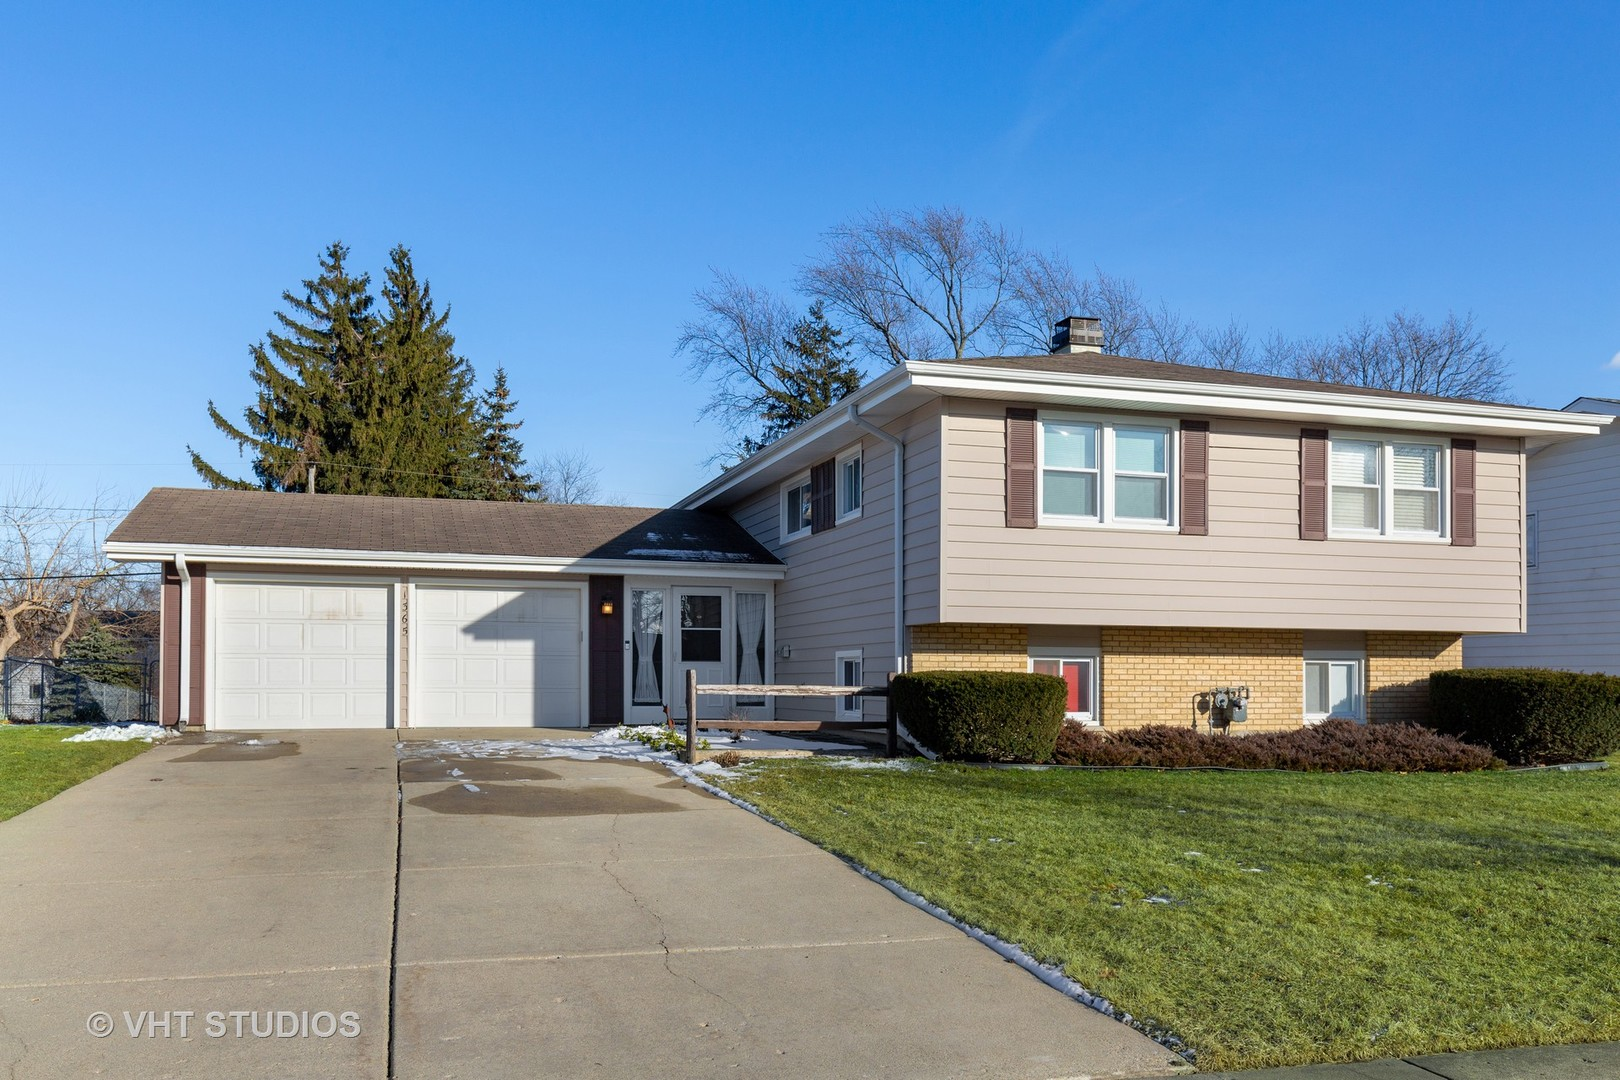 1365 Dennison, Hoffman Estates, Illinois, 60169